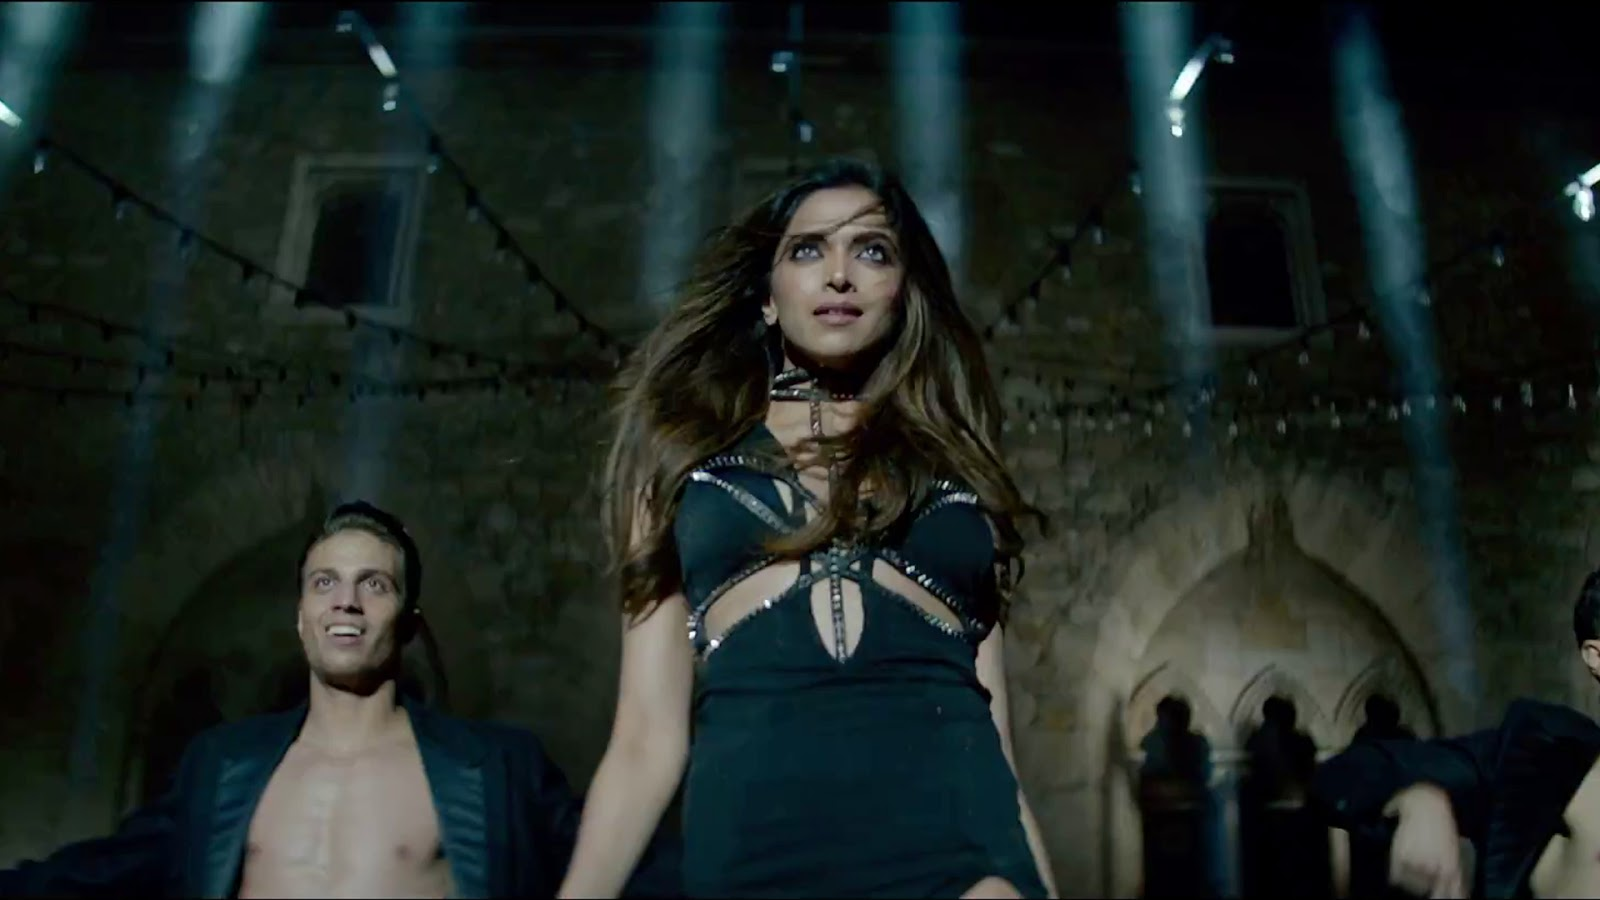 Download Bollywood Actress Hd Wallpapers 1080p Free: Deepika Padukone Wallpapers HD Download Free 1080p